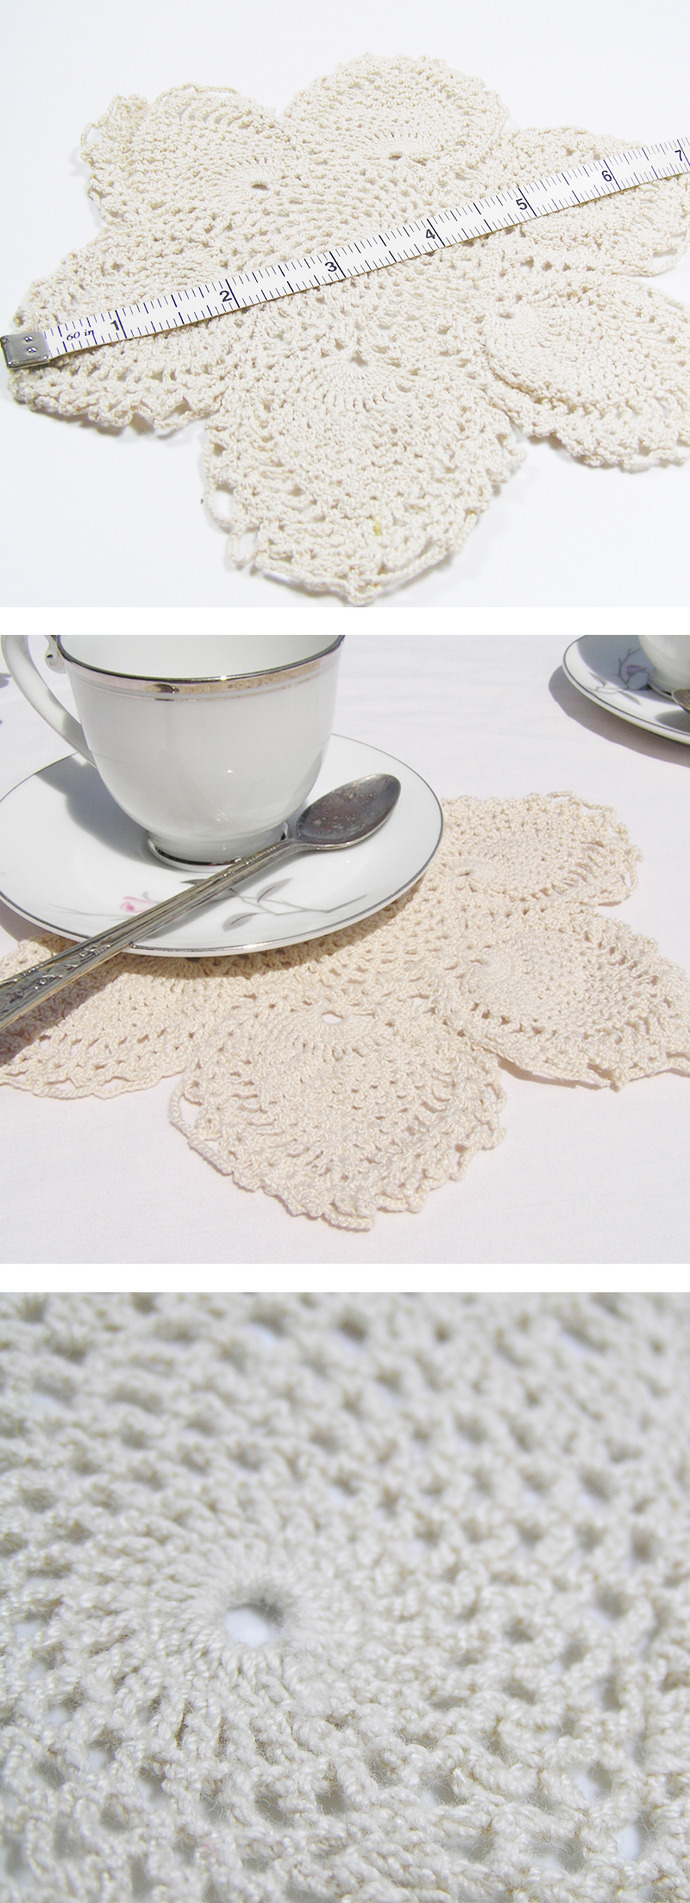 Vintage Crochet flower doily with scalloped edge, pineapple fan pattern.